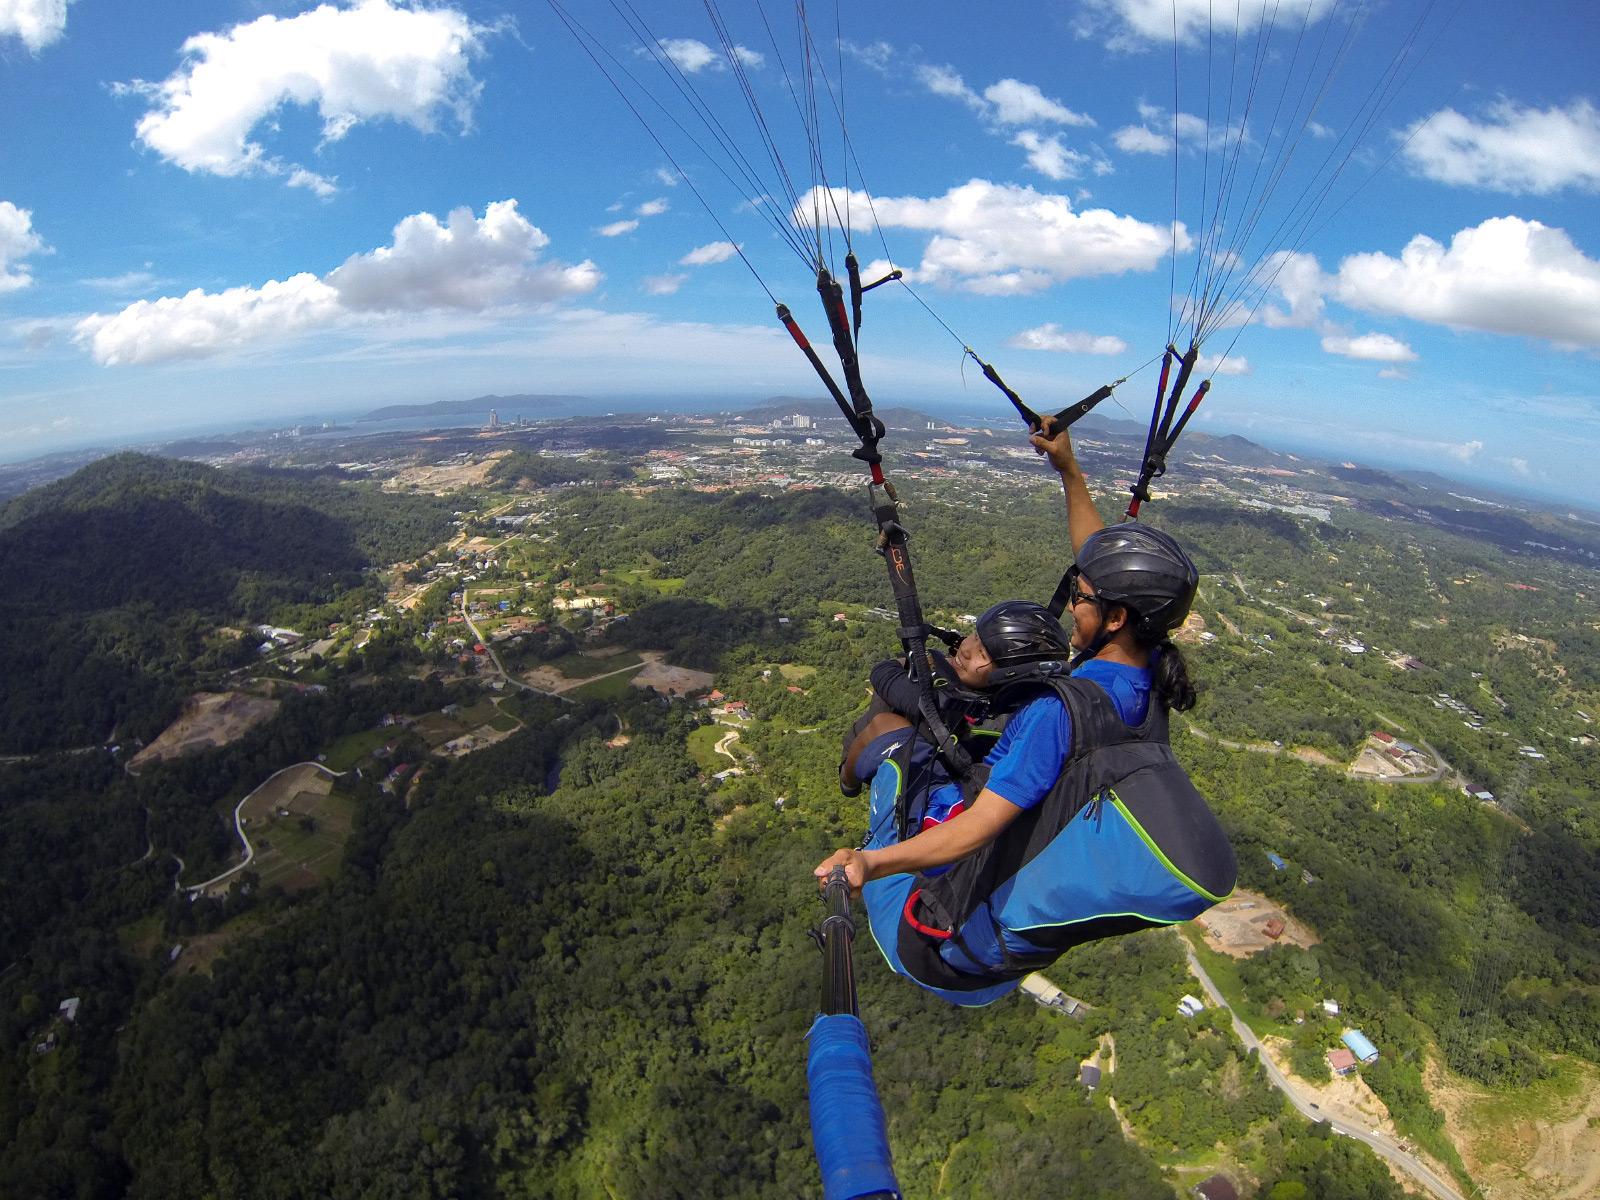 kota kinabalu resorts and hotels - paragliding over kota kinabalu